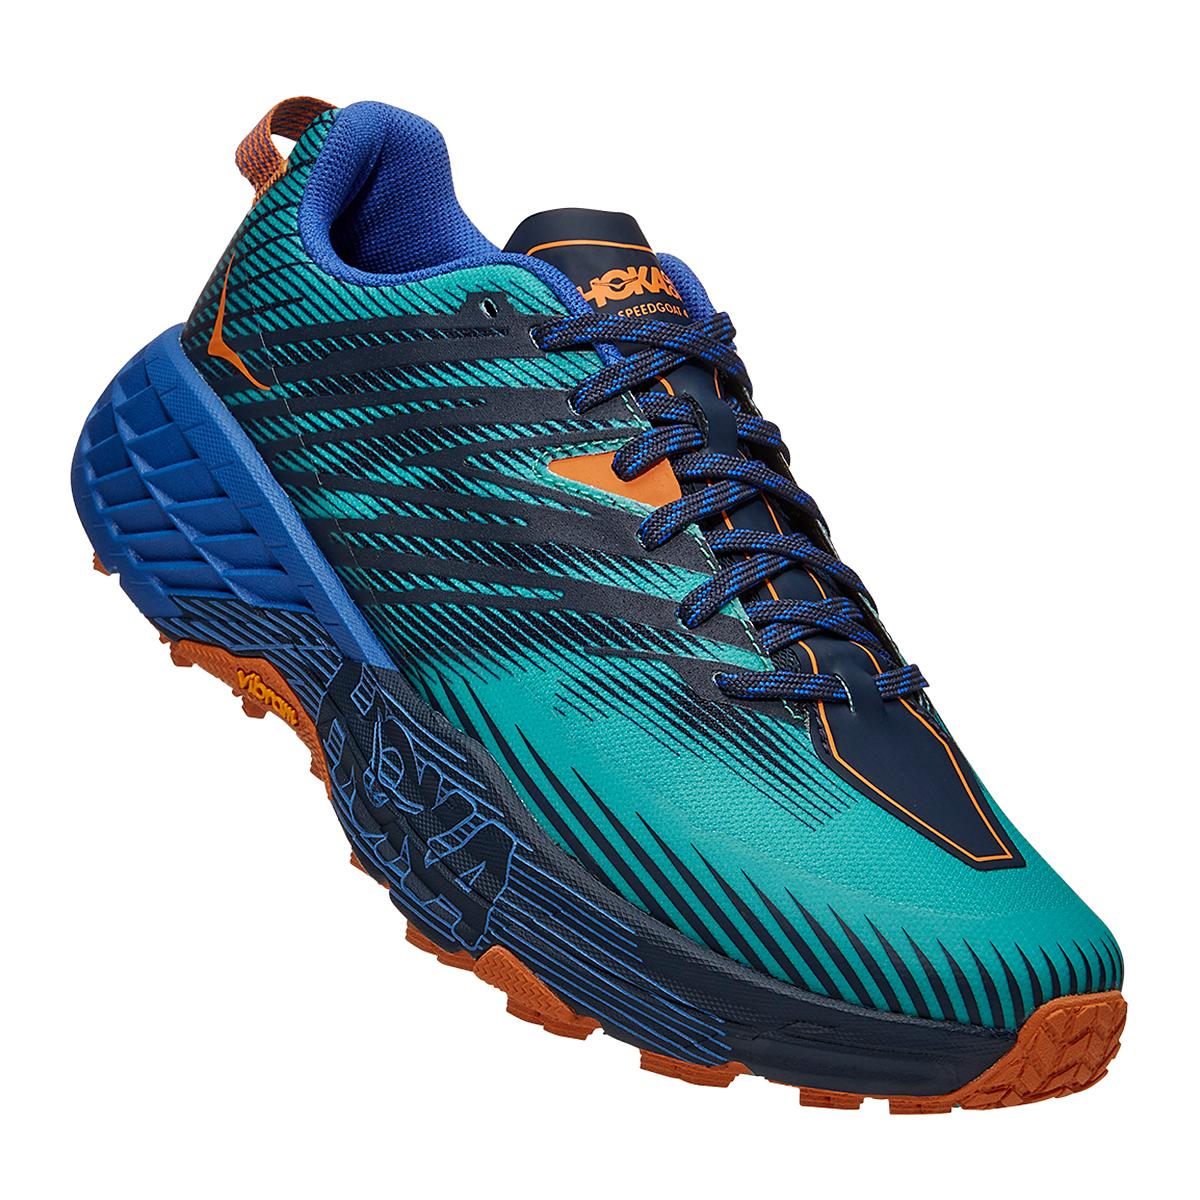 Men's Hoka One One Speedgoat 4 Trail Running Shoe - Color: Atlantis/Dazzling Blue - Size: 7 - Width: Regular, Atlantis/Dazzling Blue, large, image 2